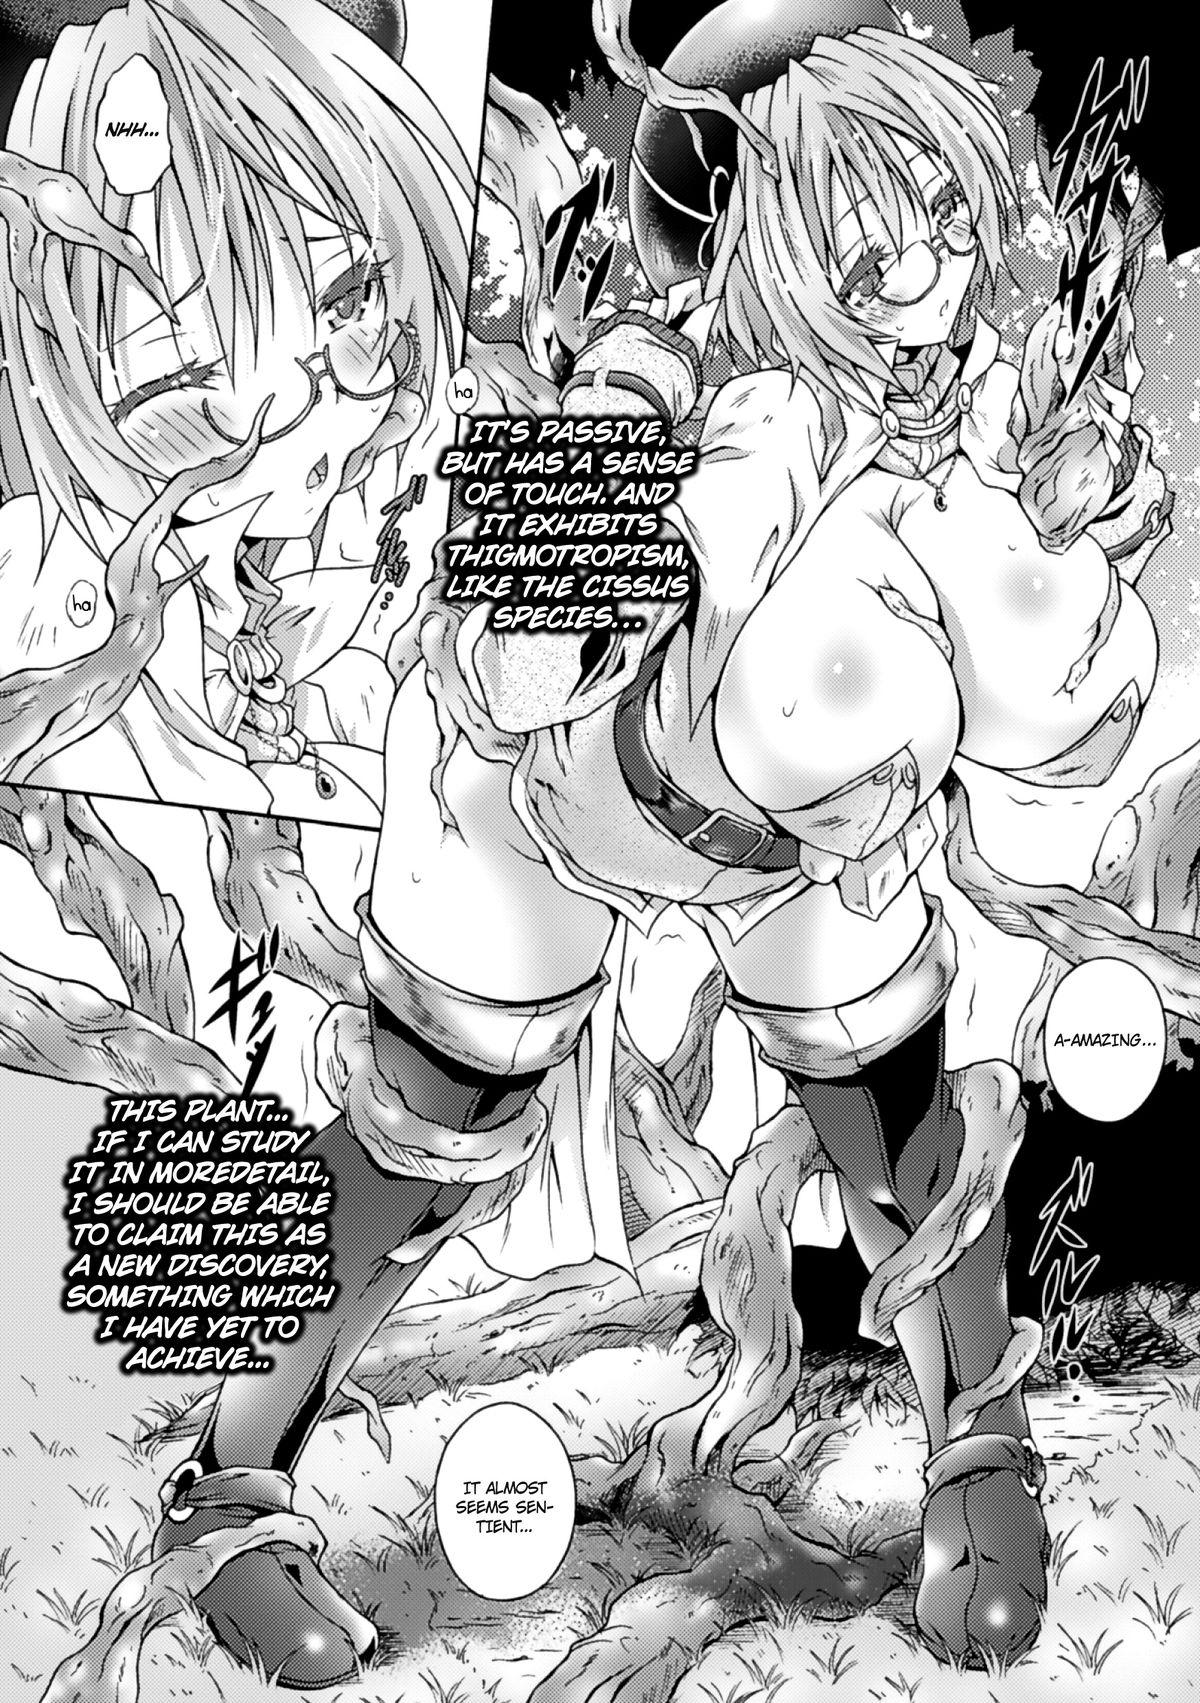 2D Comic Magazine Shokubutsukan de Monzetsu Acme Saki! Vol. 2 29